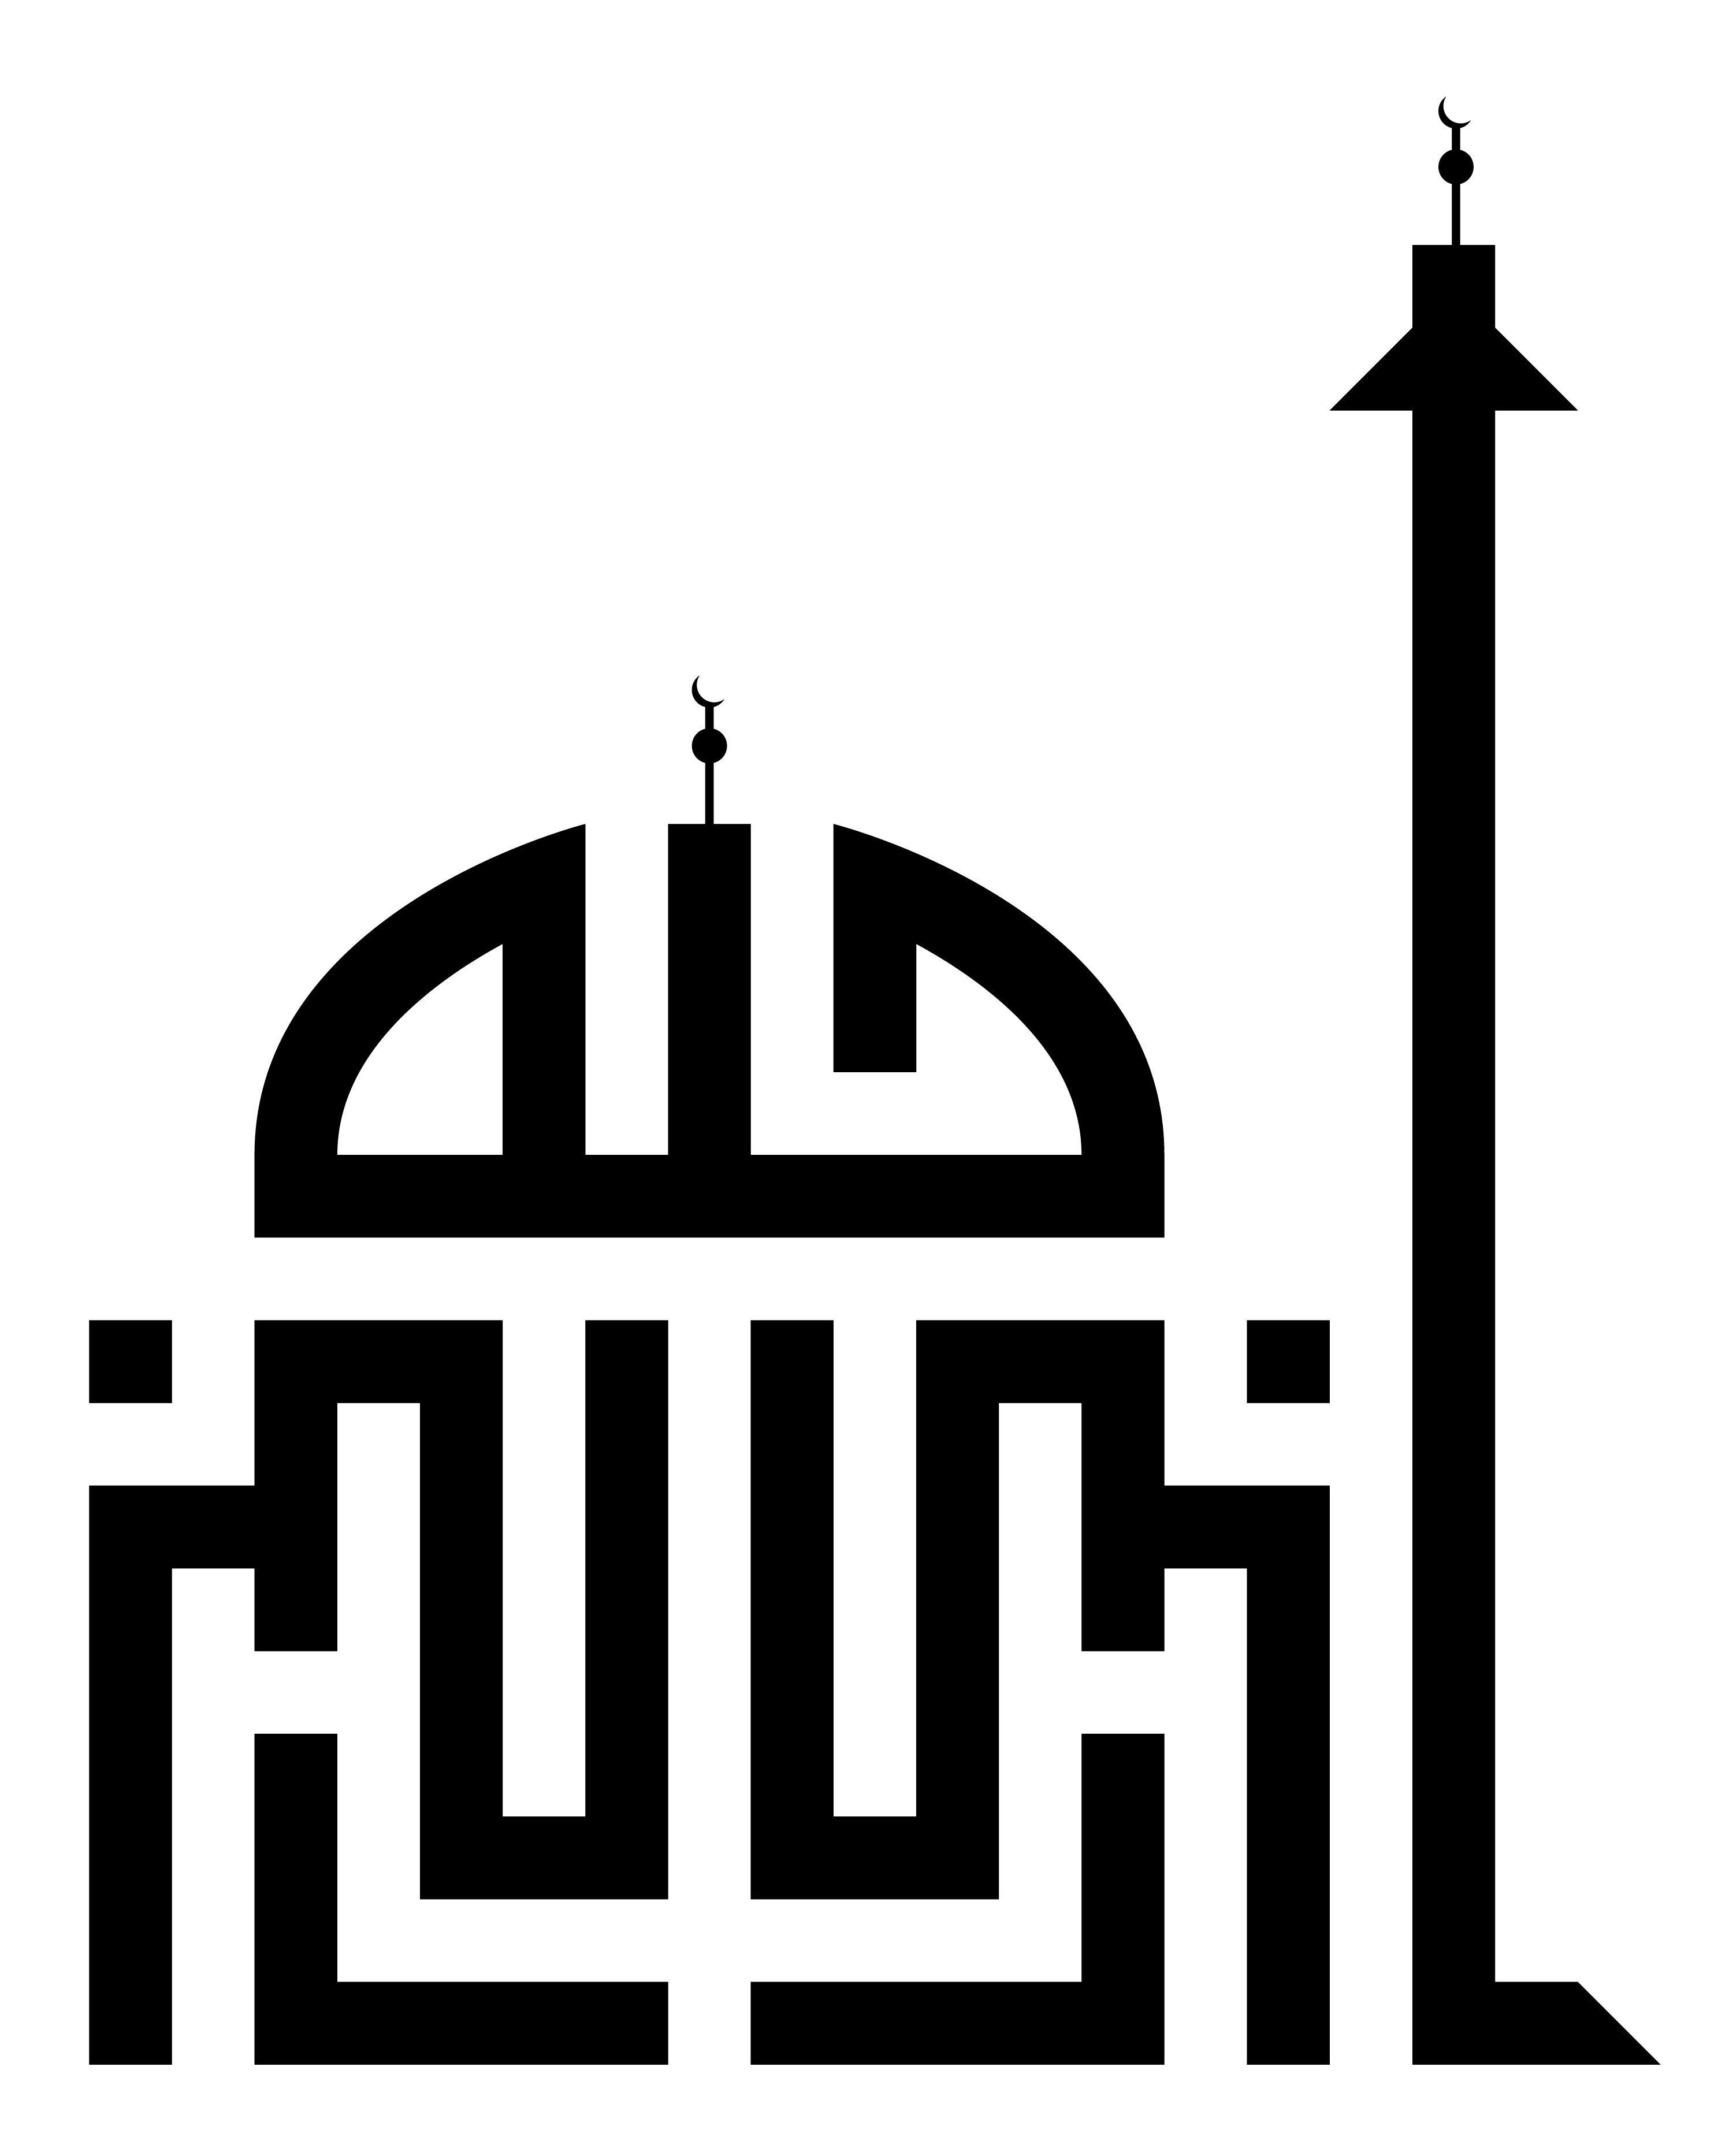 Allahu Akbar Mosque Mosque Islamic Art Islamic Calligraphy